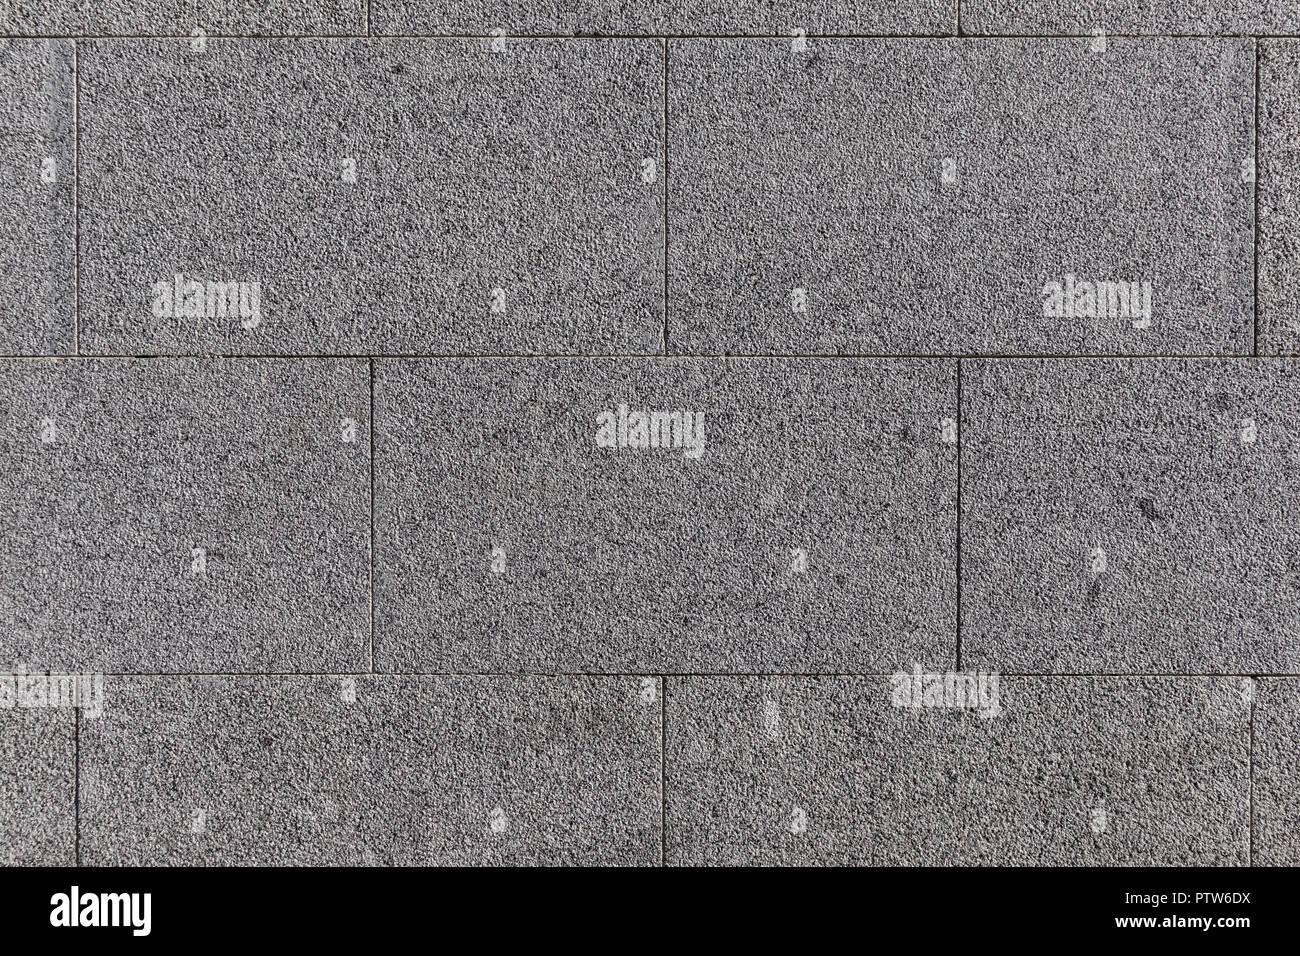 Textura de pared de piedra - Stock Image